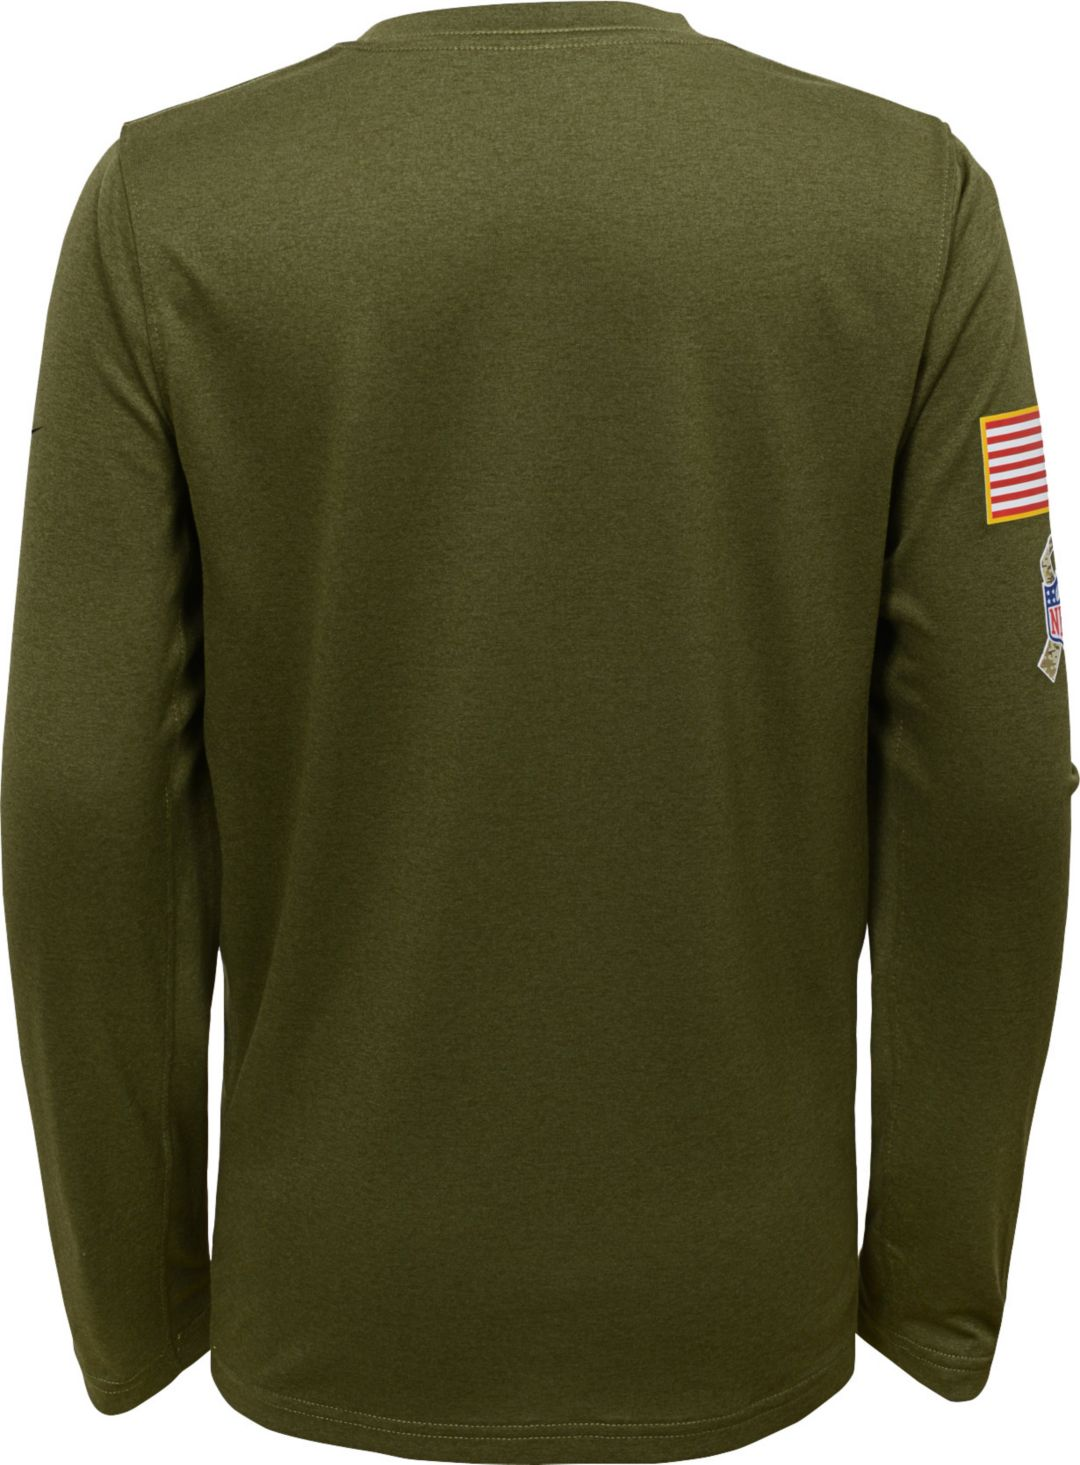 ea455bfaf ... to Service Carolina Panthers Legend Long Sleeve Olive Shirt.  noImageFound. Previous. 1. 2